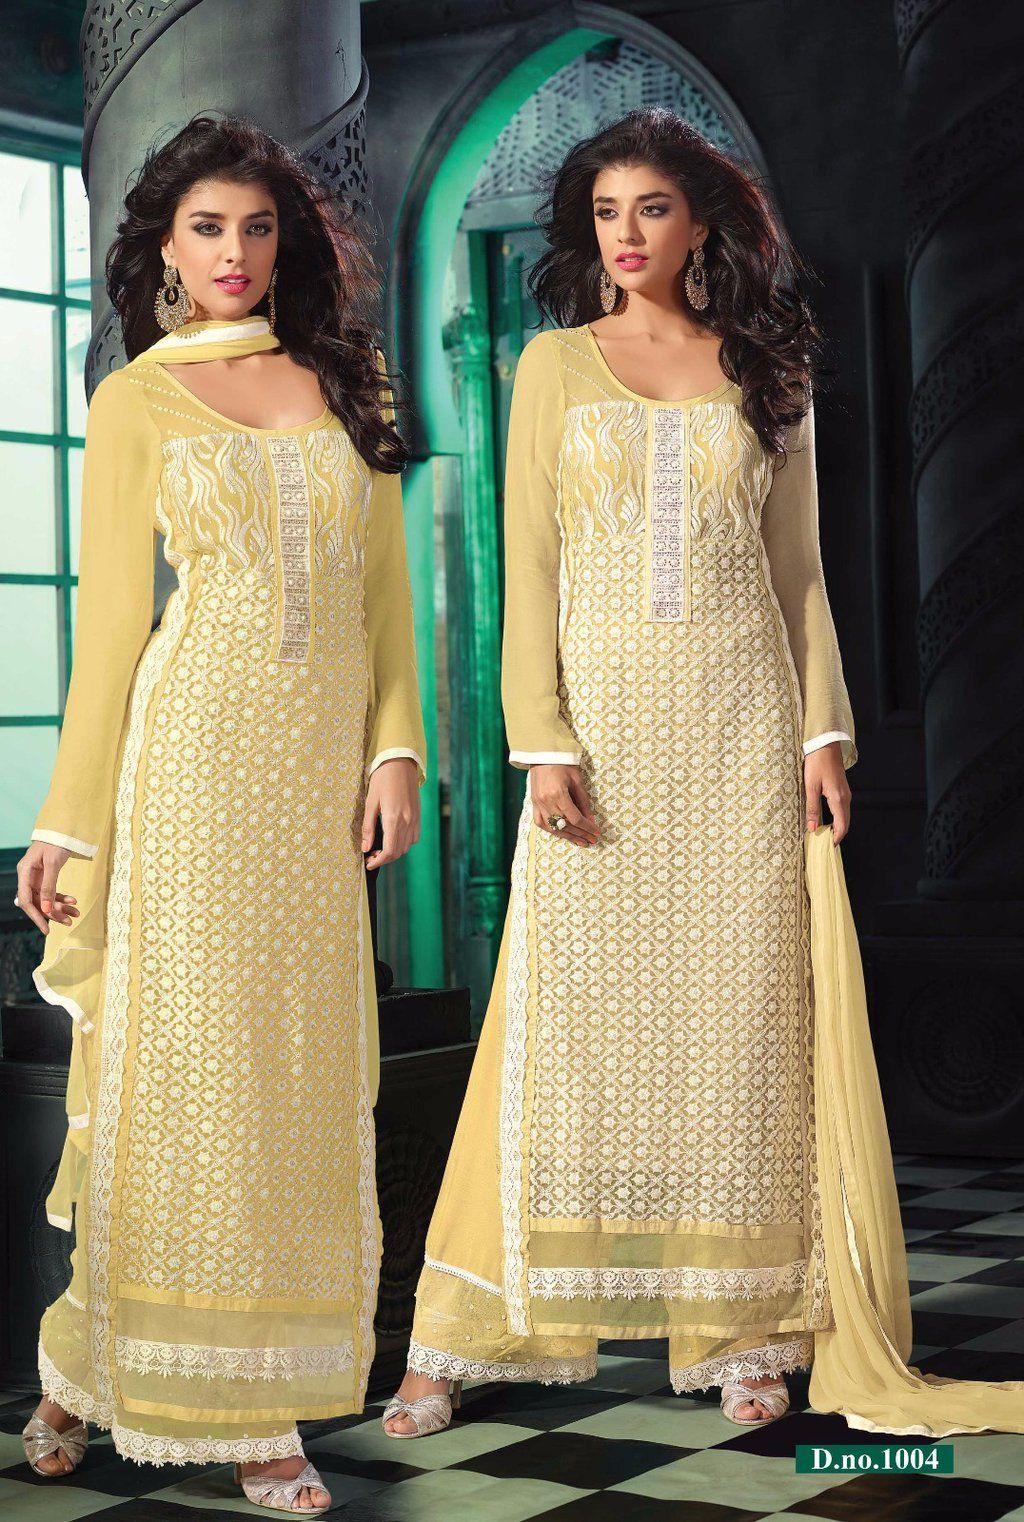 @mastanikreation #Mastani #mastanidress #pakistanidress #onlineshopping #ethnicwear #plazodress #straightcut Share!!